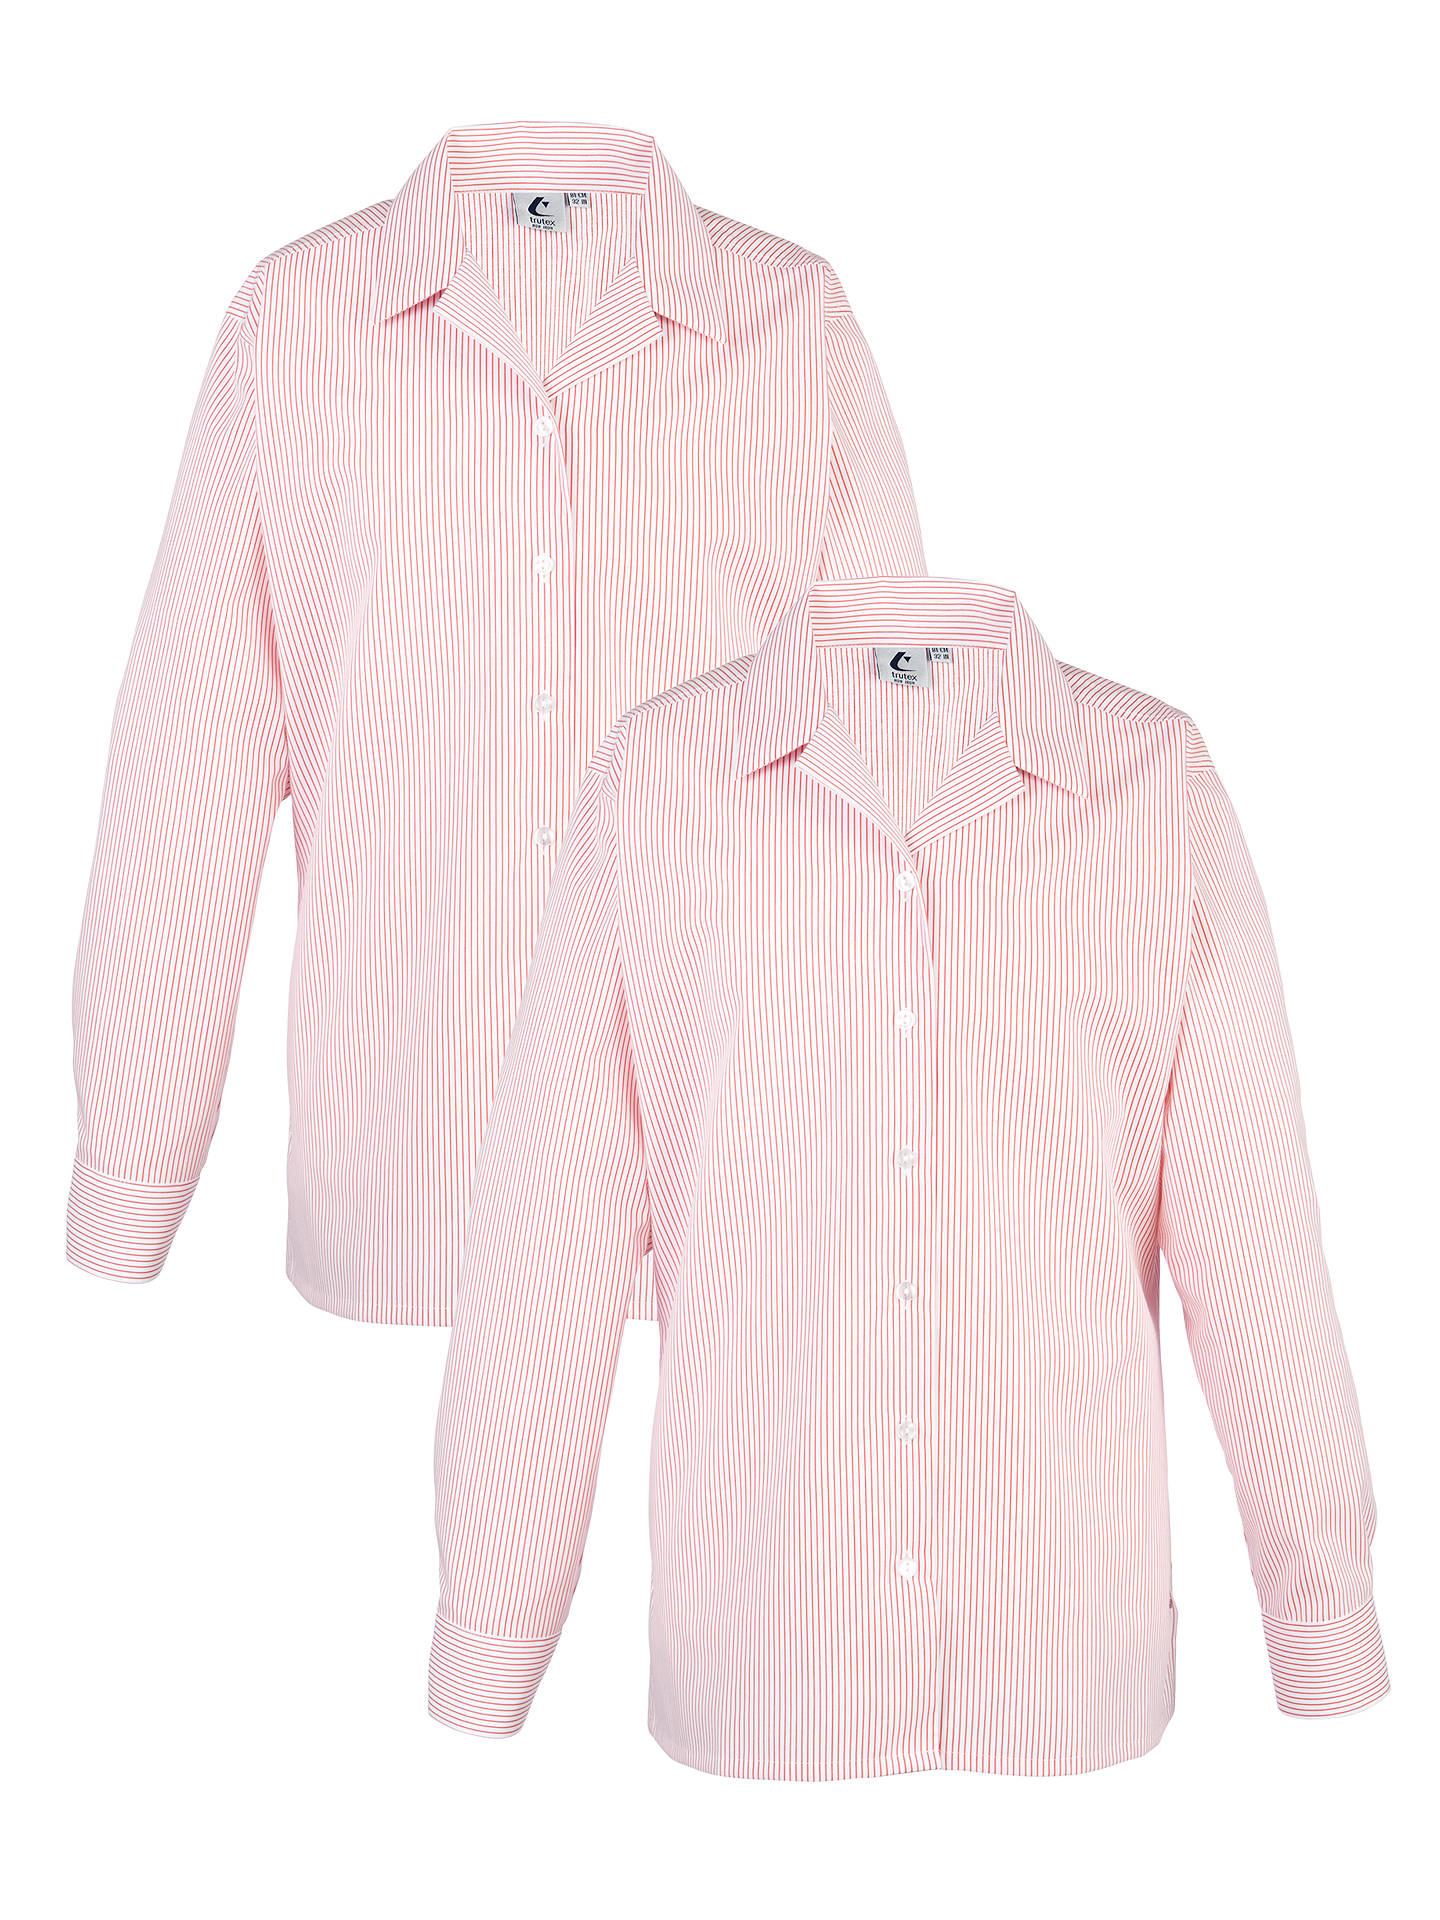 34c38b8681a BuyGirls  School Long Sleeve Striped Blouse